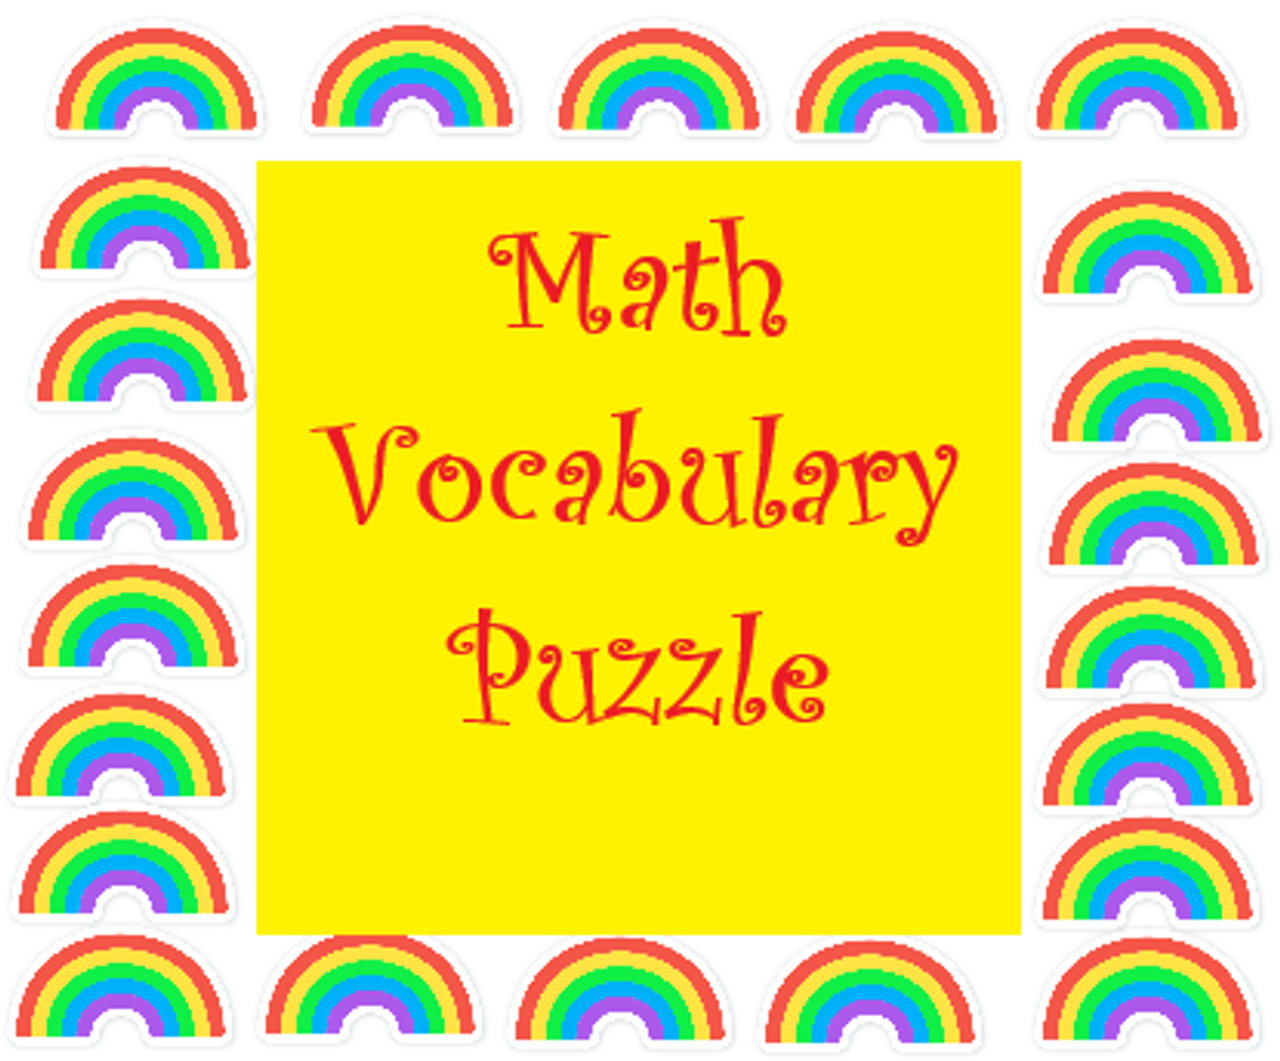 Math Vocabulary Crossword Puzzle